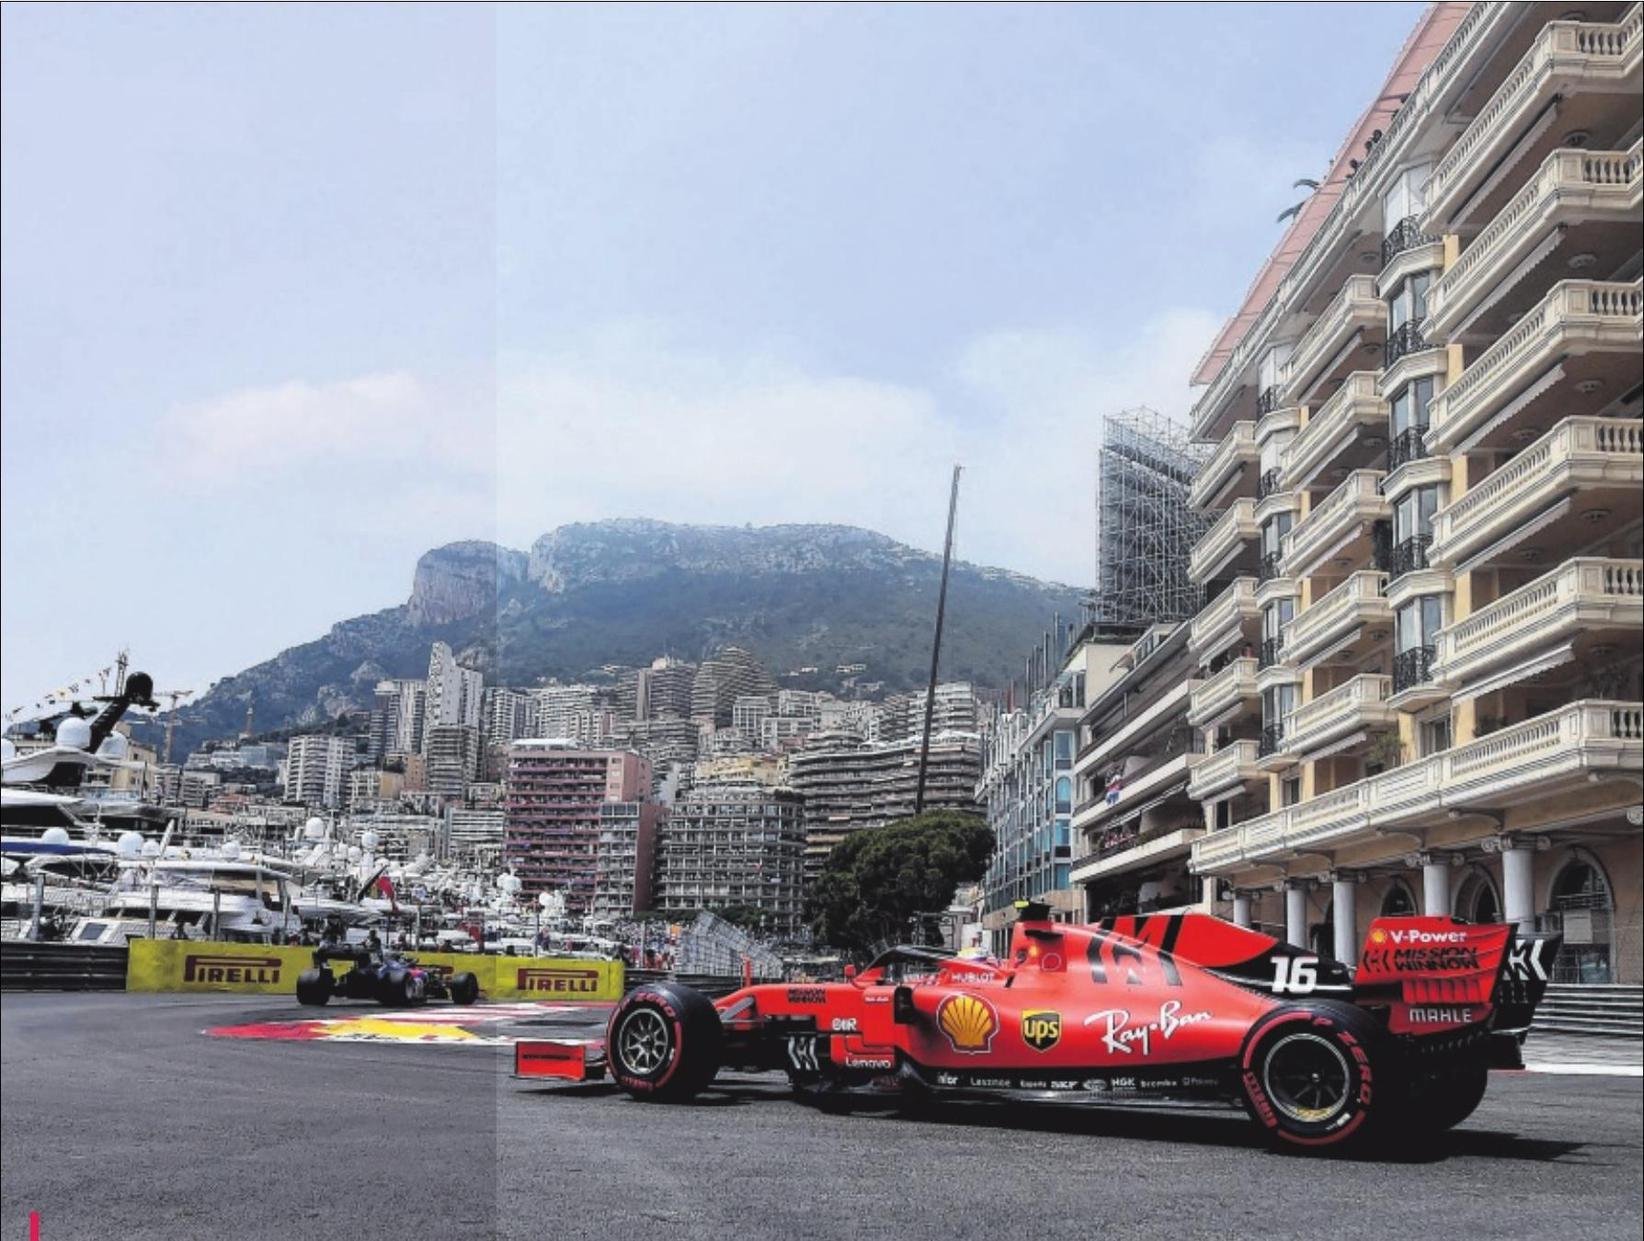 Éric BRETON Envoyé spécial à Monaco,ebreton@laprovence.com